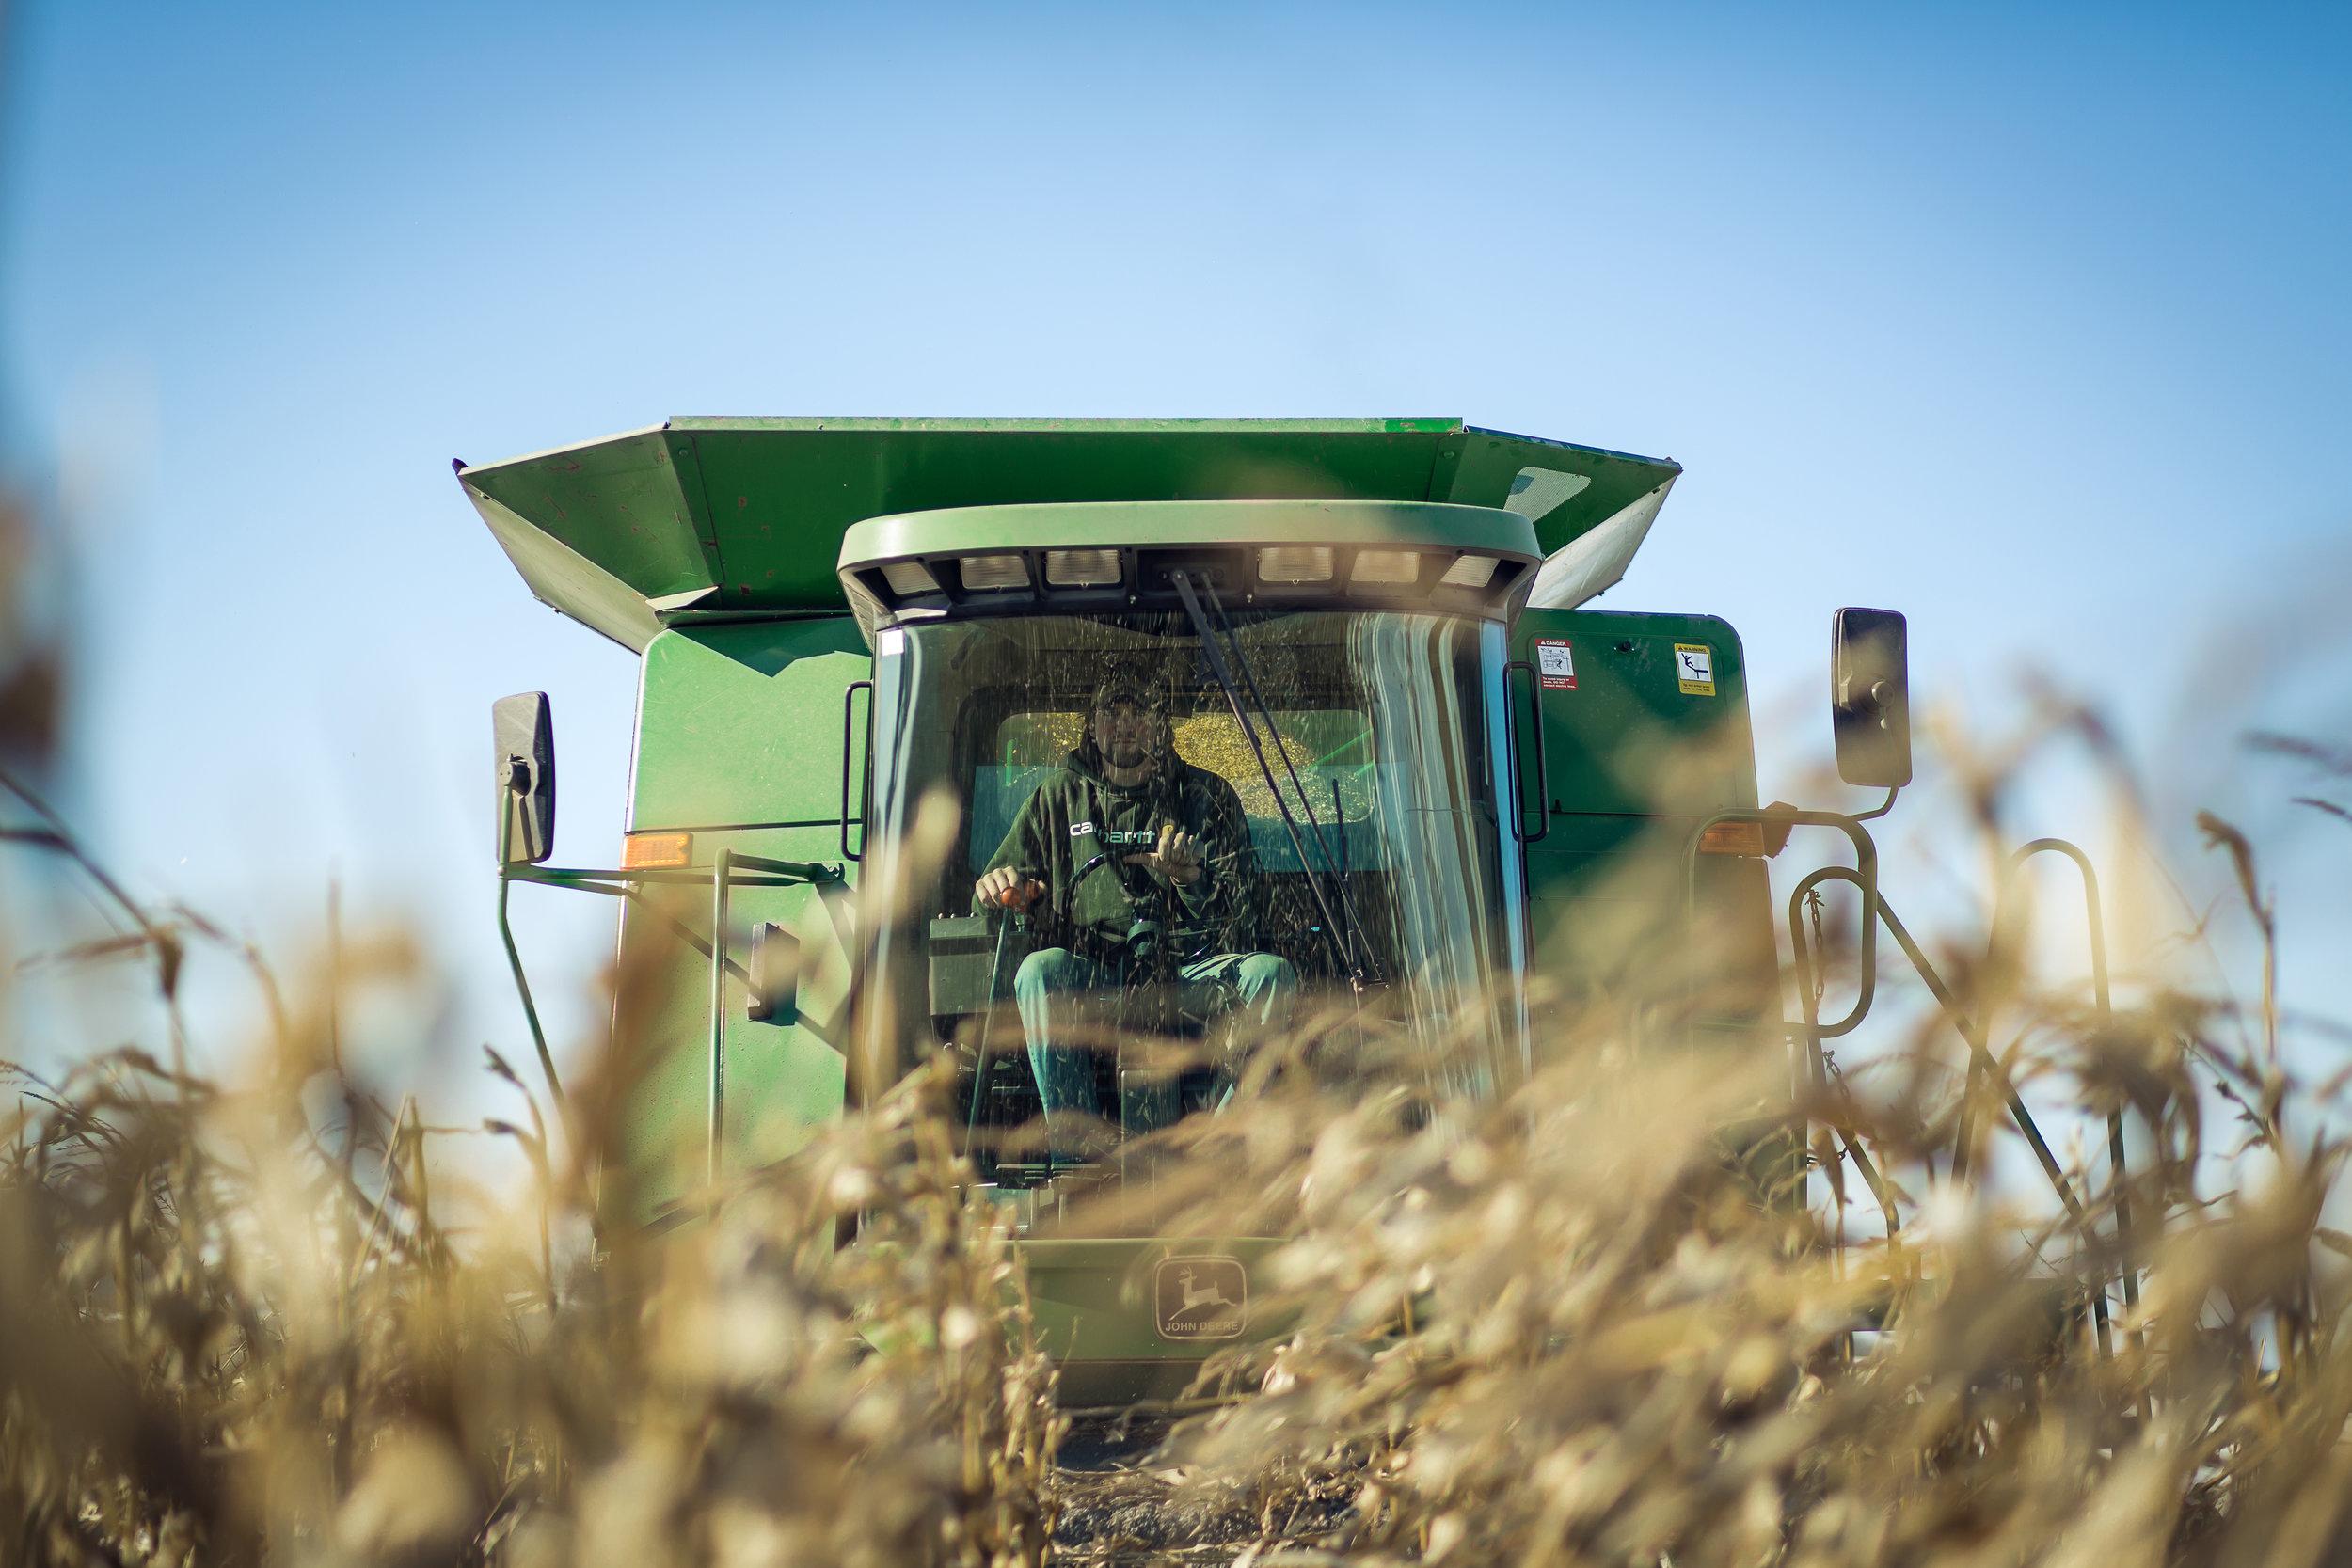 Corn_Harvest_11-14-2014-5235.JPG